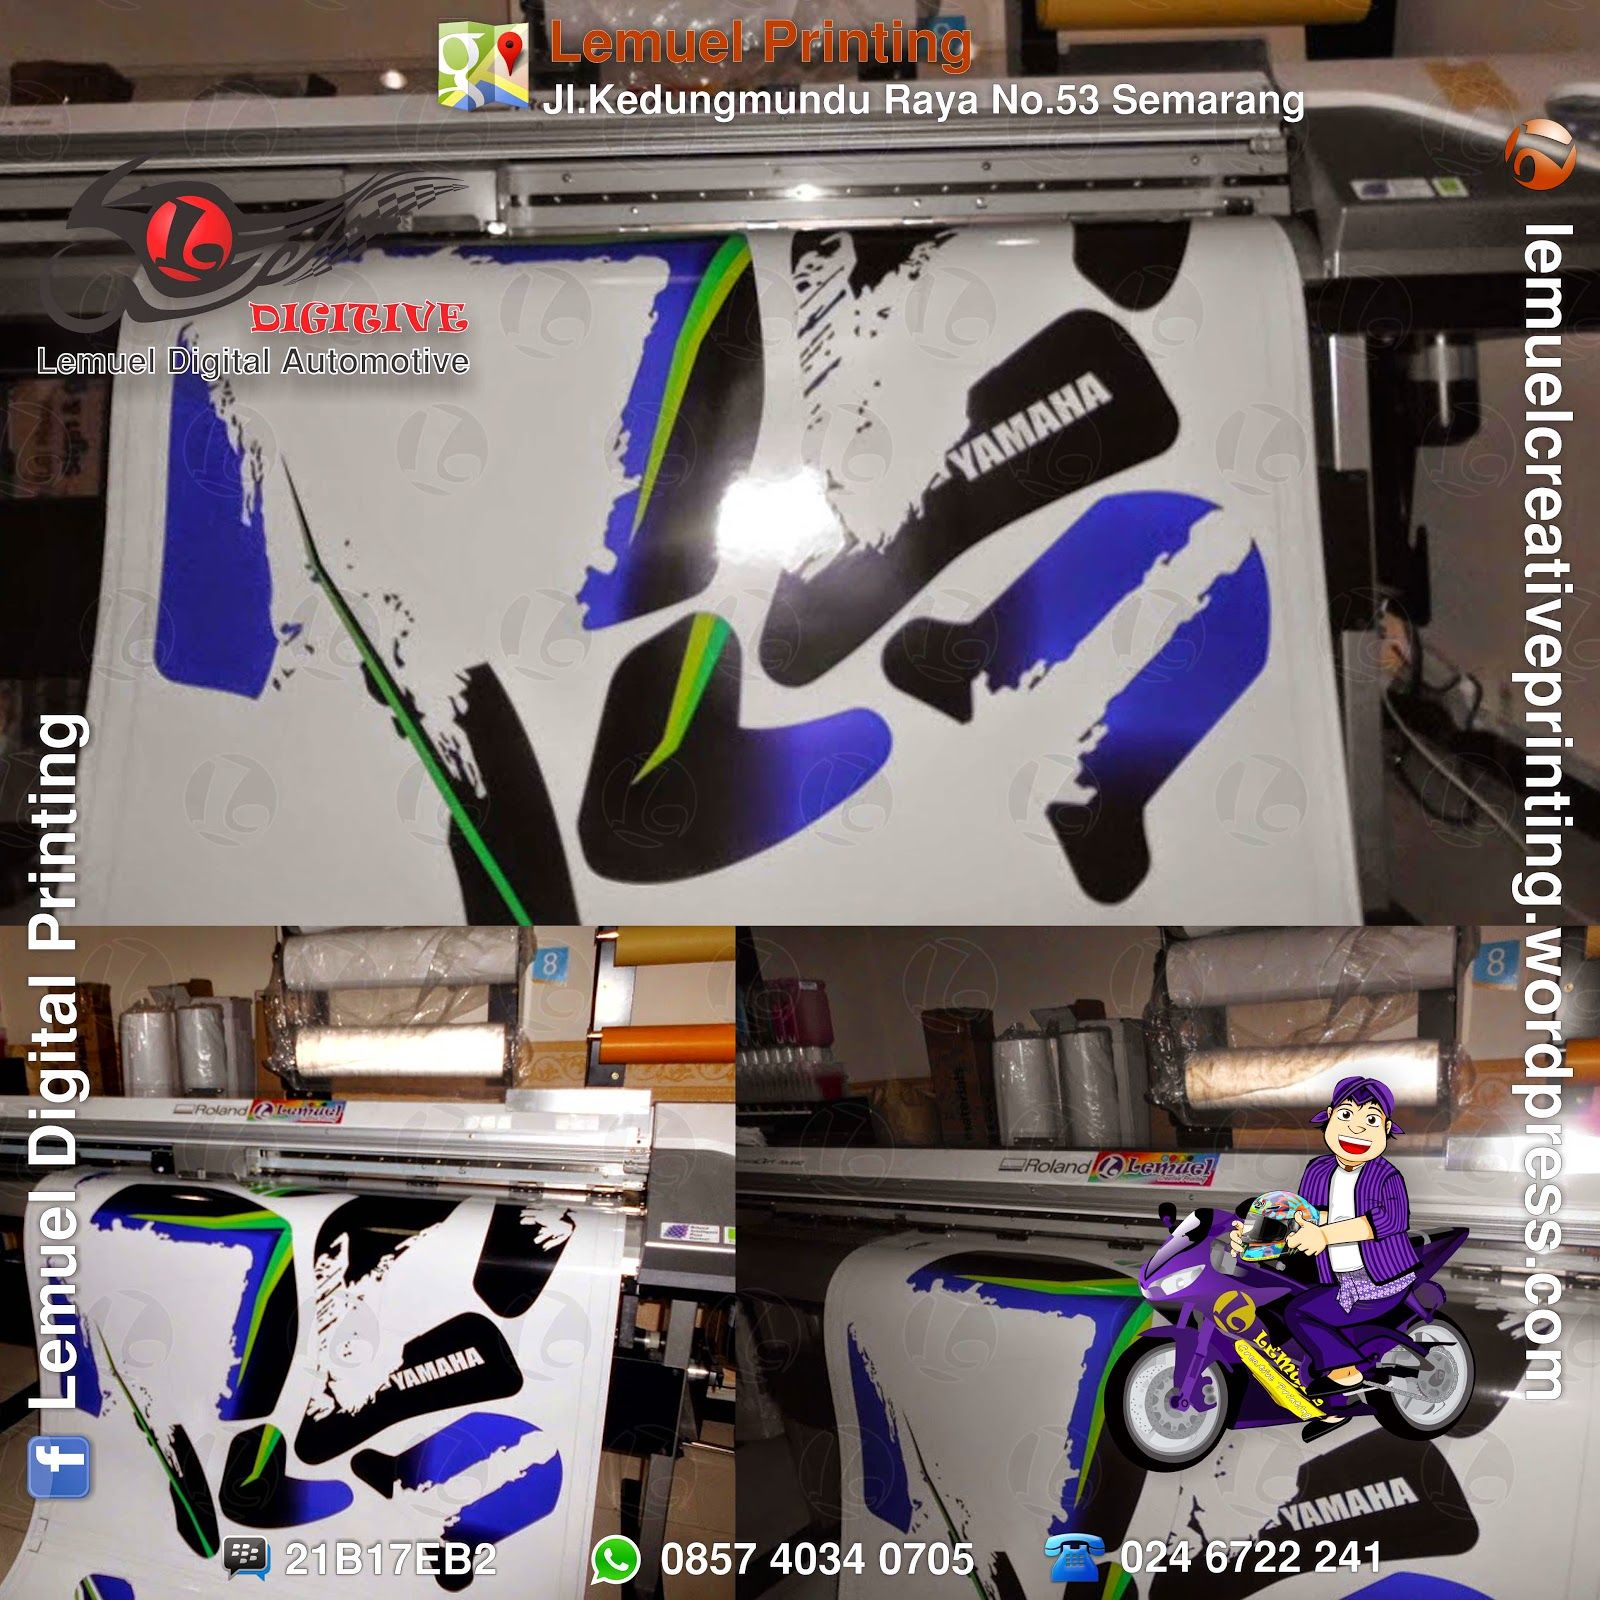 Lemuel Produksi Decal Vinyl Striping Motor Full Body Di Yamaha R25